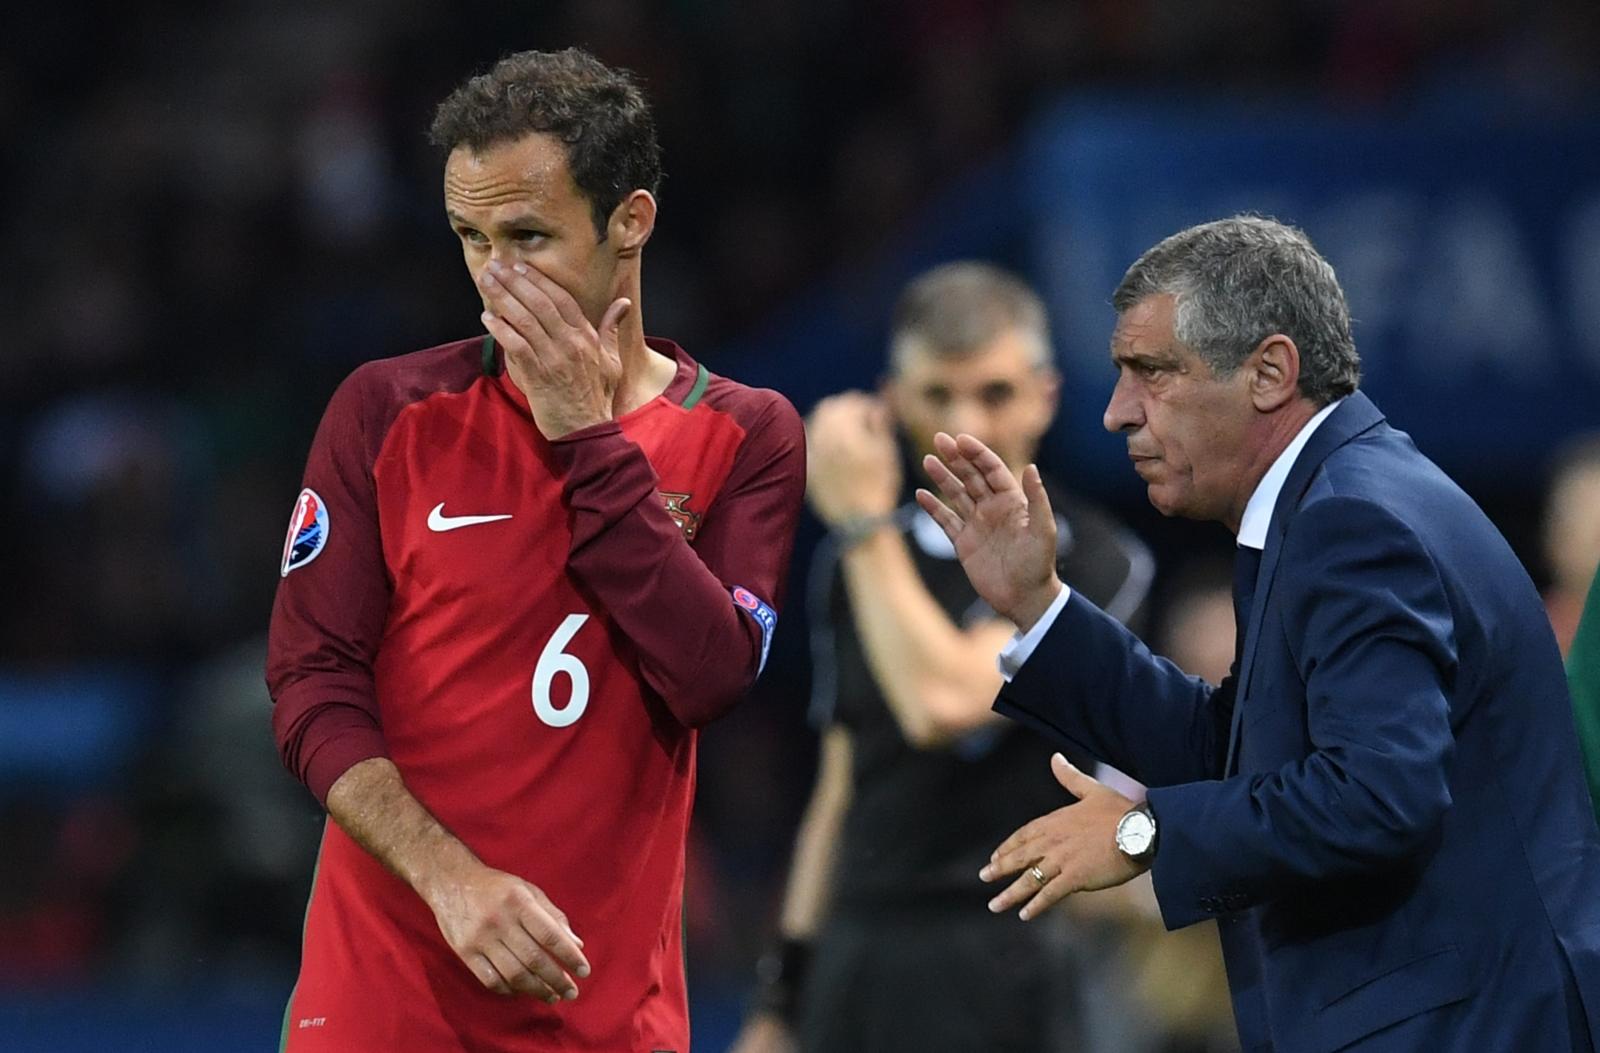 Ricardo Carvalho seeks some instructions